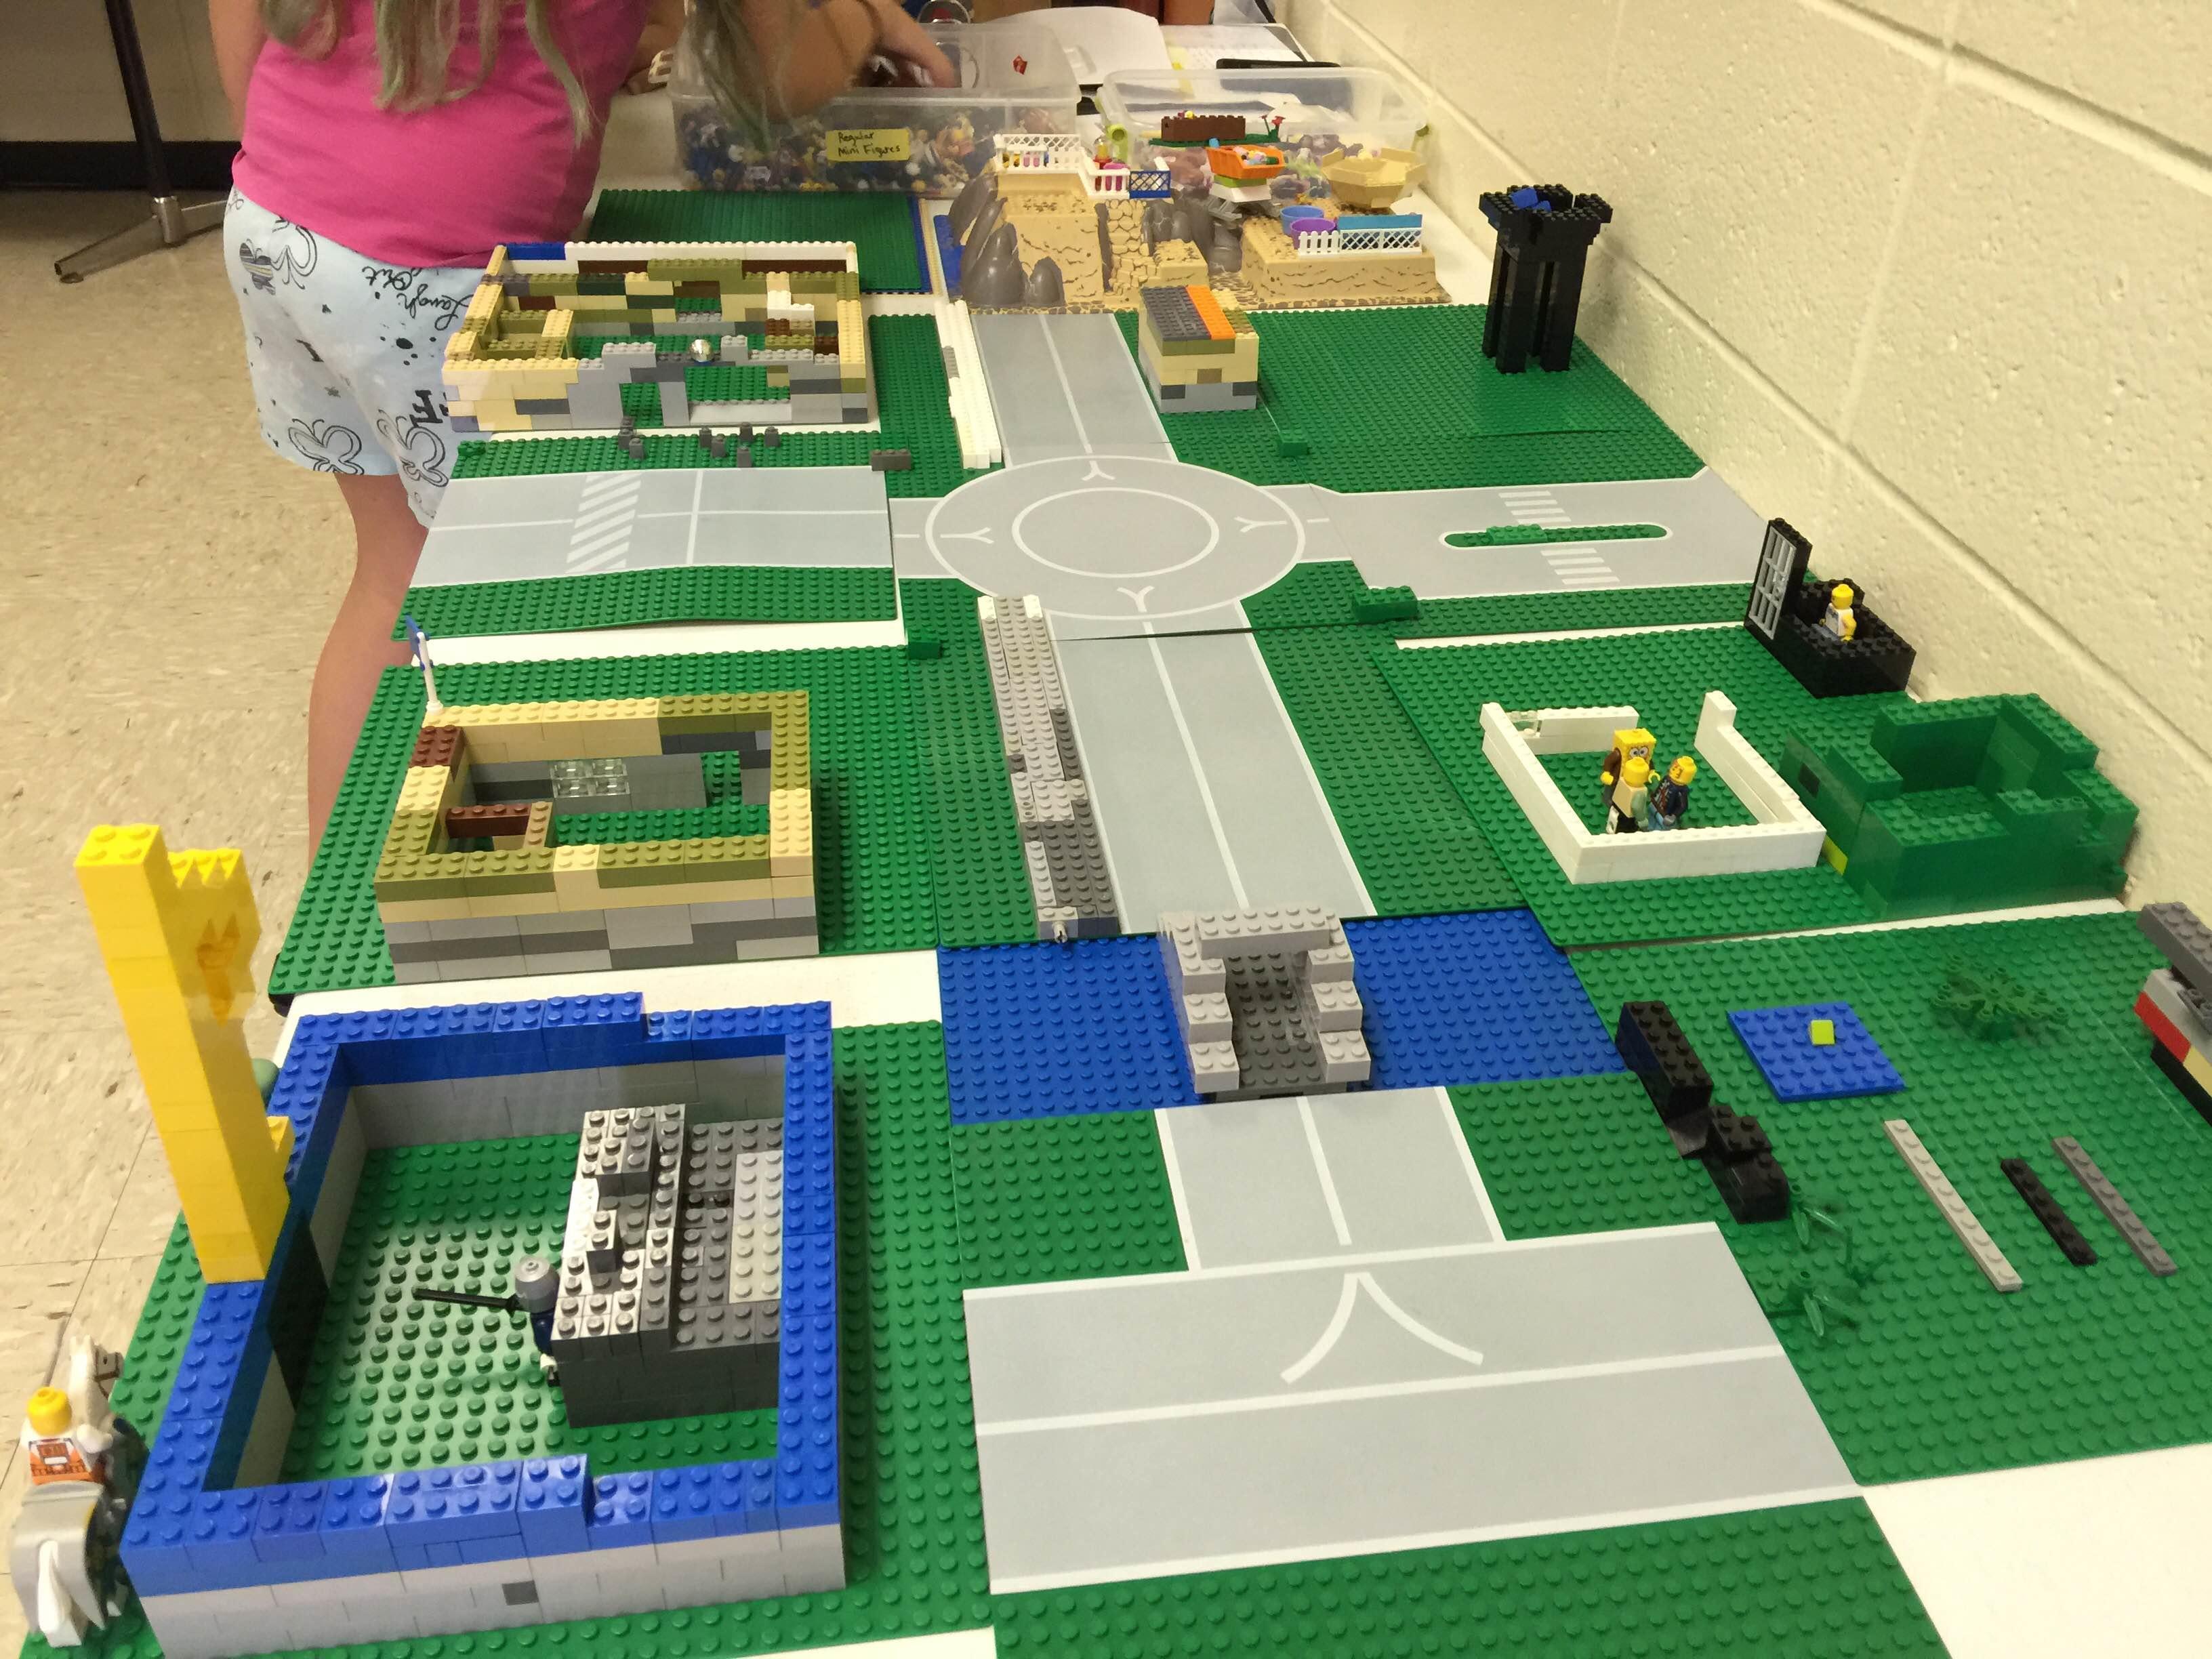 LEGOCity and Brick Mania Camp- City of Frederick